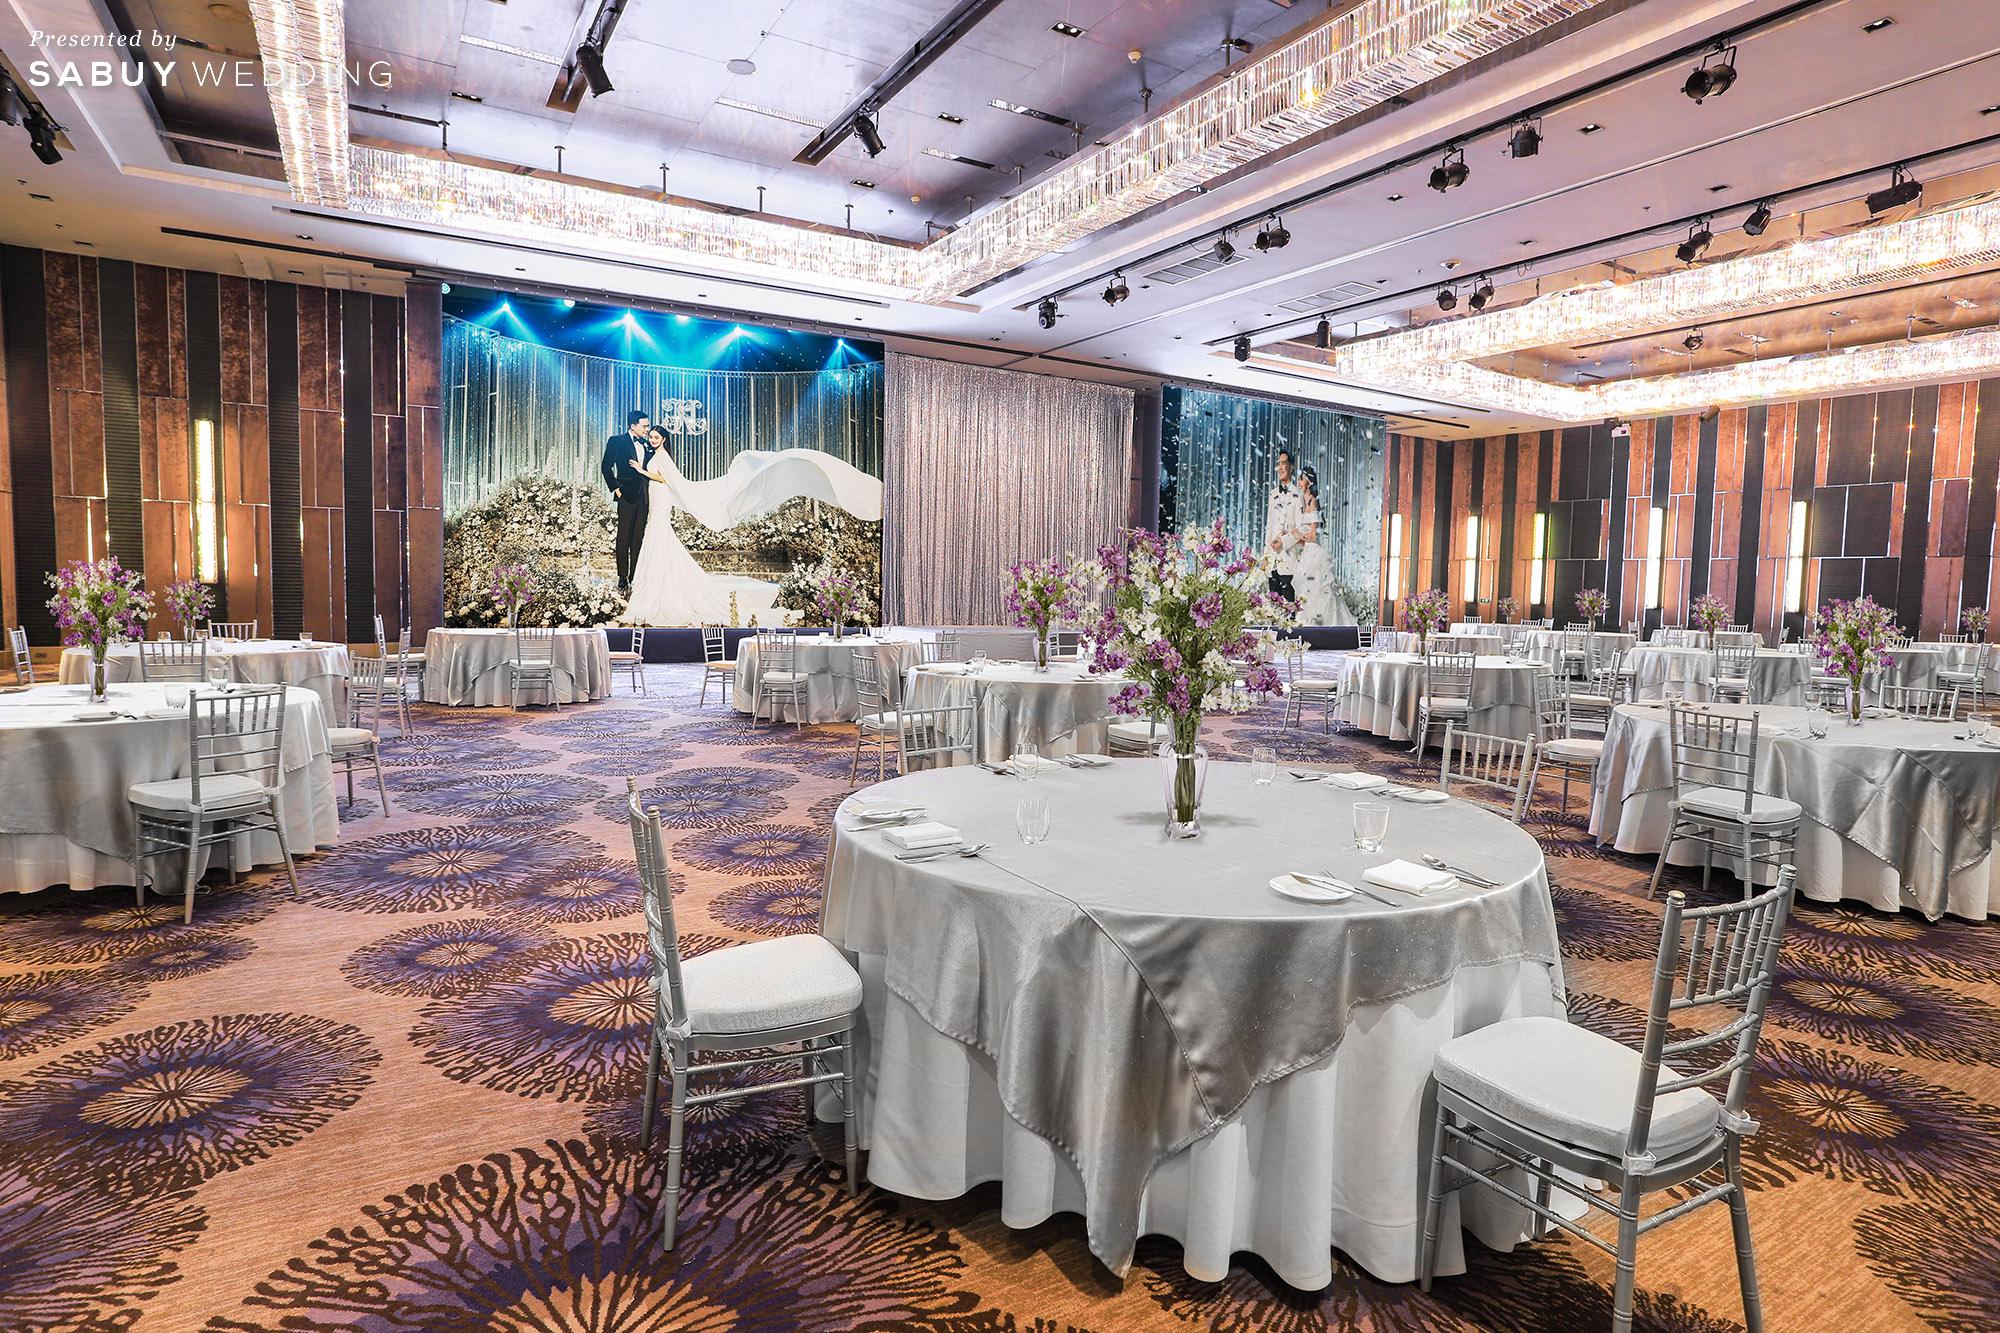 RENAISSANCE BANGKOK RATCHAPRASONG HOTEL,Marriott Wedding Thailand,แมริออท ประเทศไทย,สถานที่แต่งงาน,สถานที่จัดงานแต่งงาน,โรงแรม,งานแต่งงาน,งานเลี้ยง ครบทุกความต้องการของบ่าวสาว กับ 40 สถานที่แต่งงานในเครือ Marriott